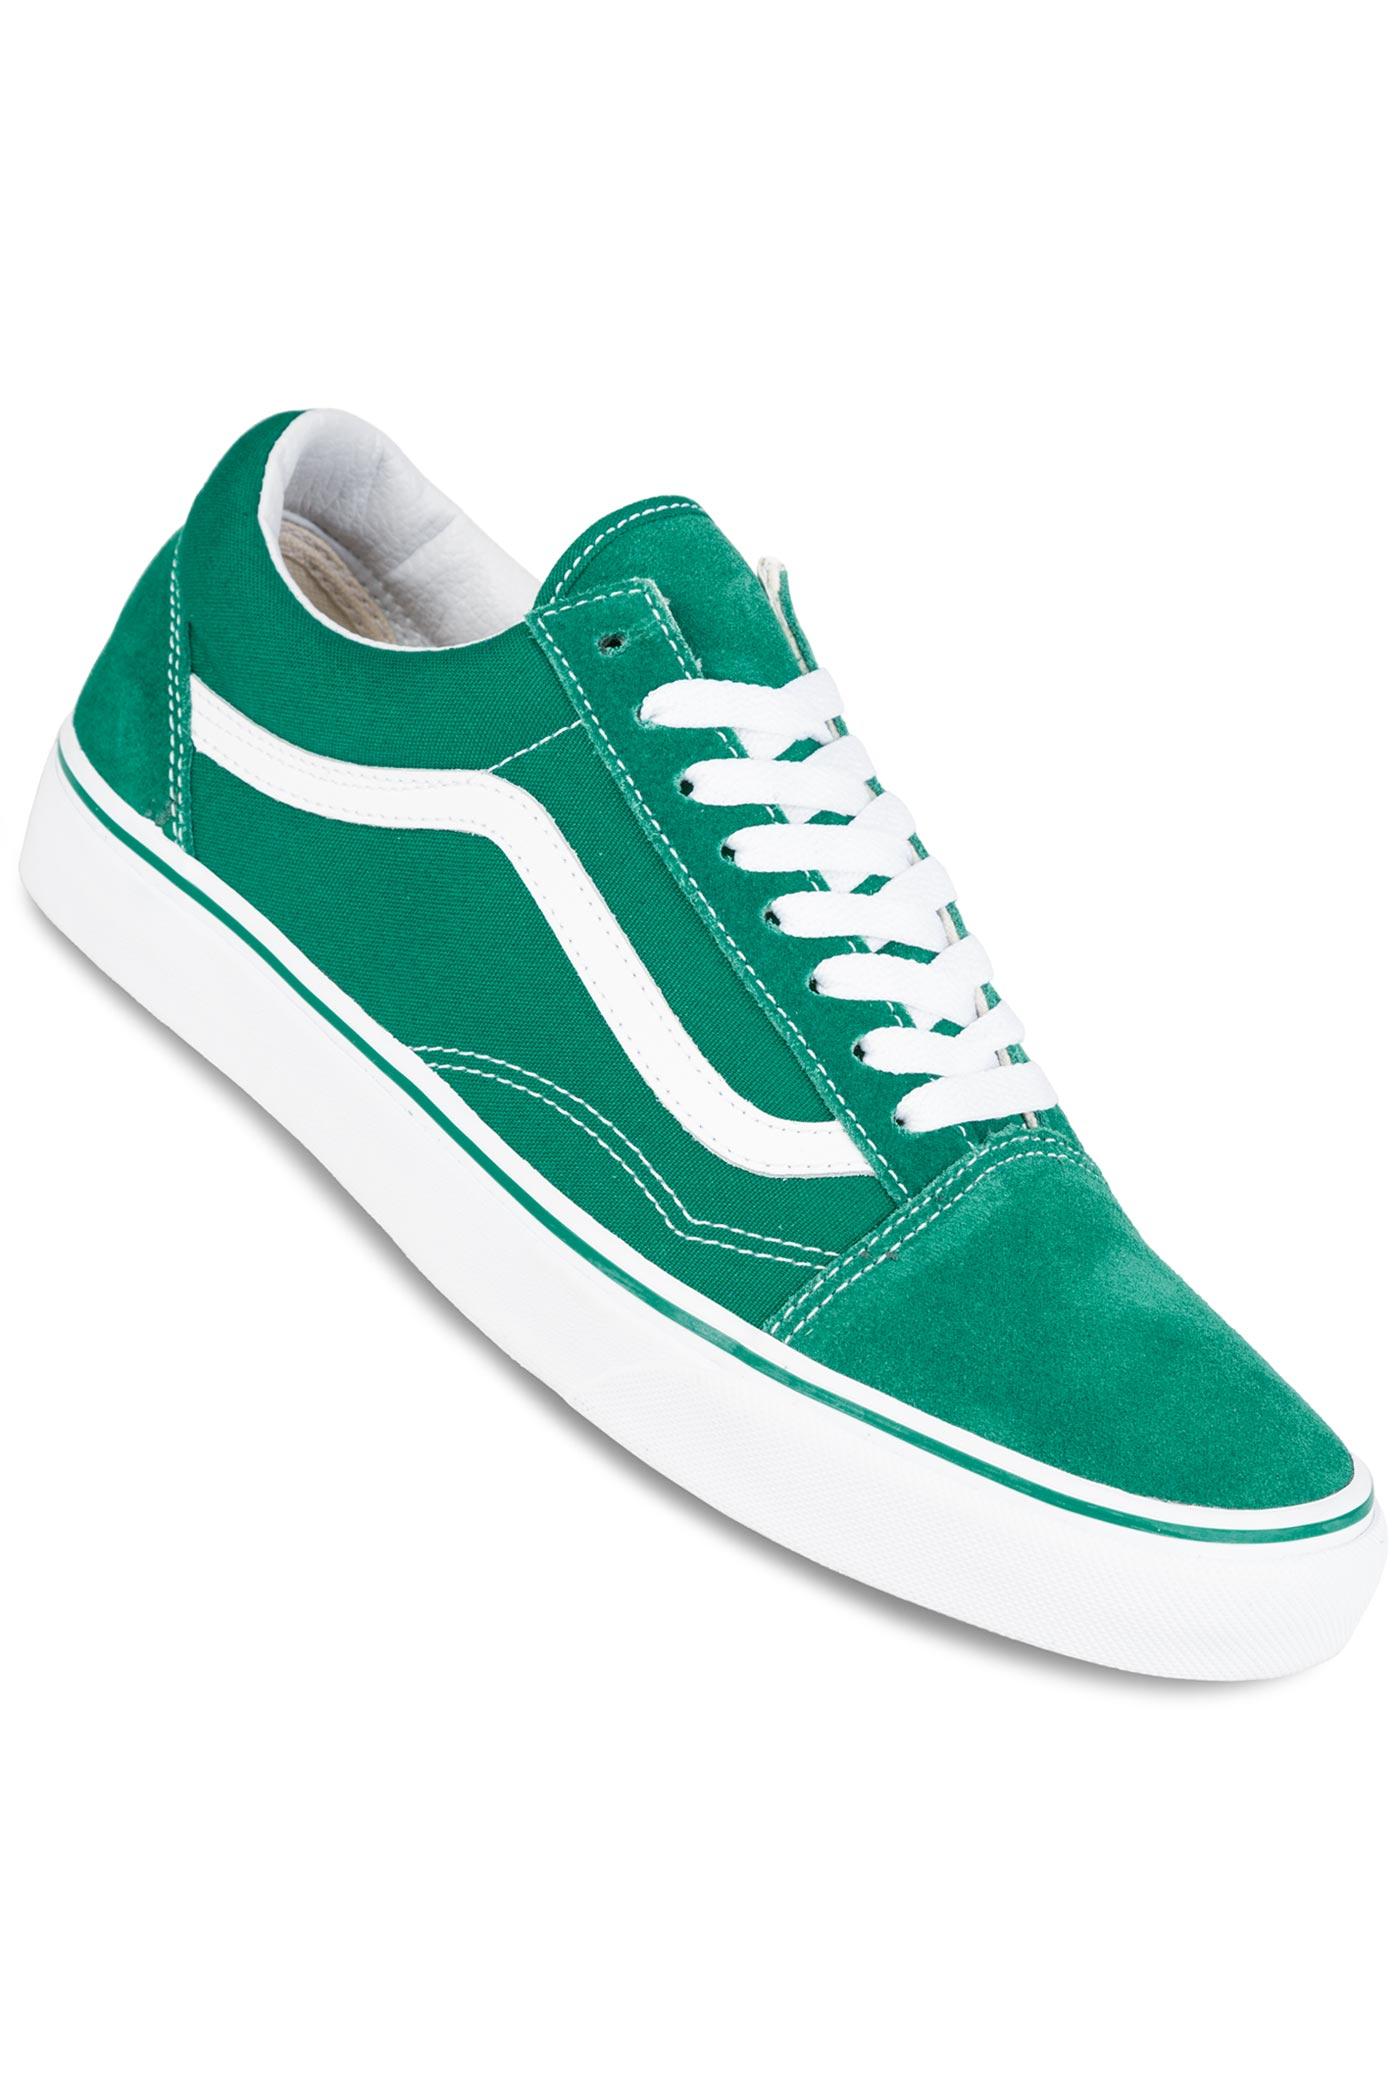 vans old skool shoes ultramarine green true white buy at. Black Bedroom Furniture Sets. Home Design Ideas